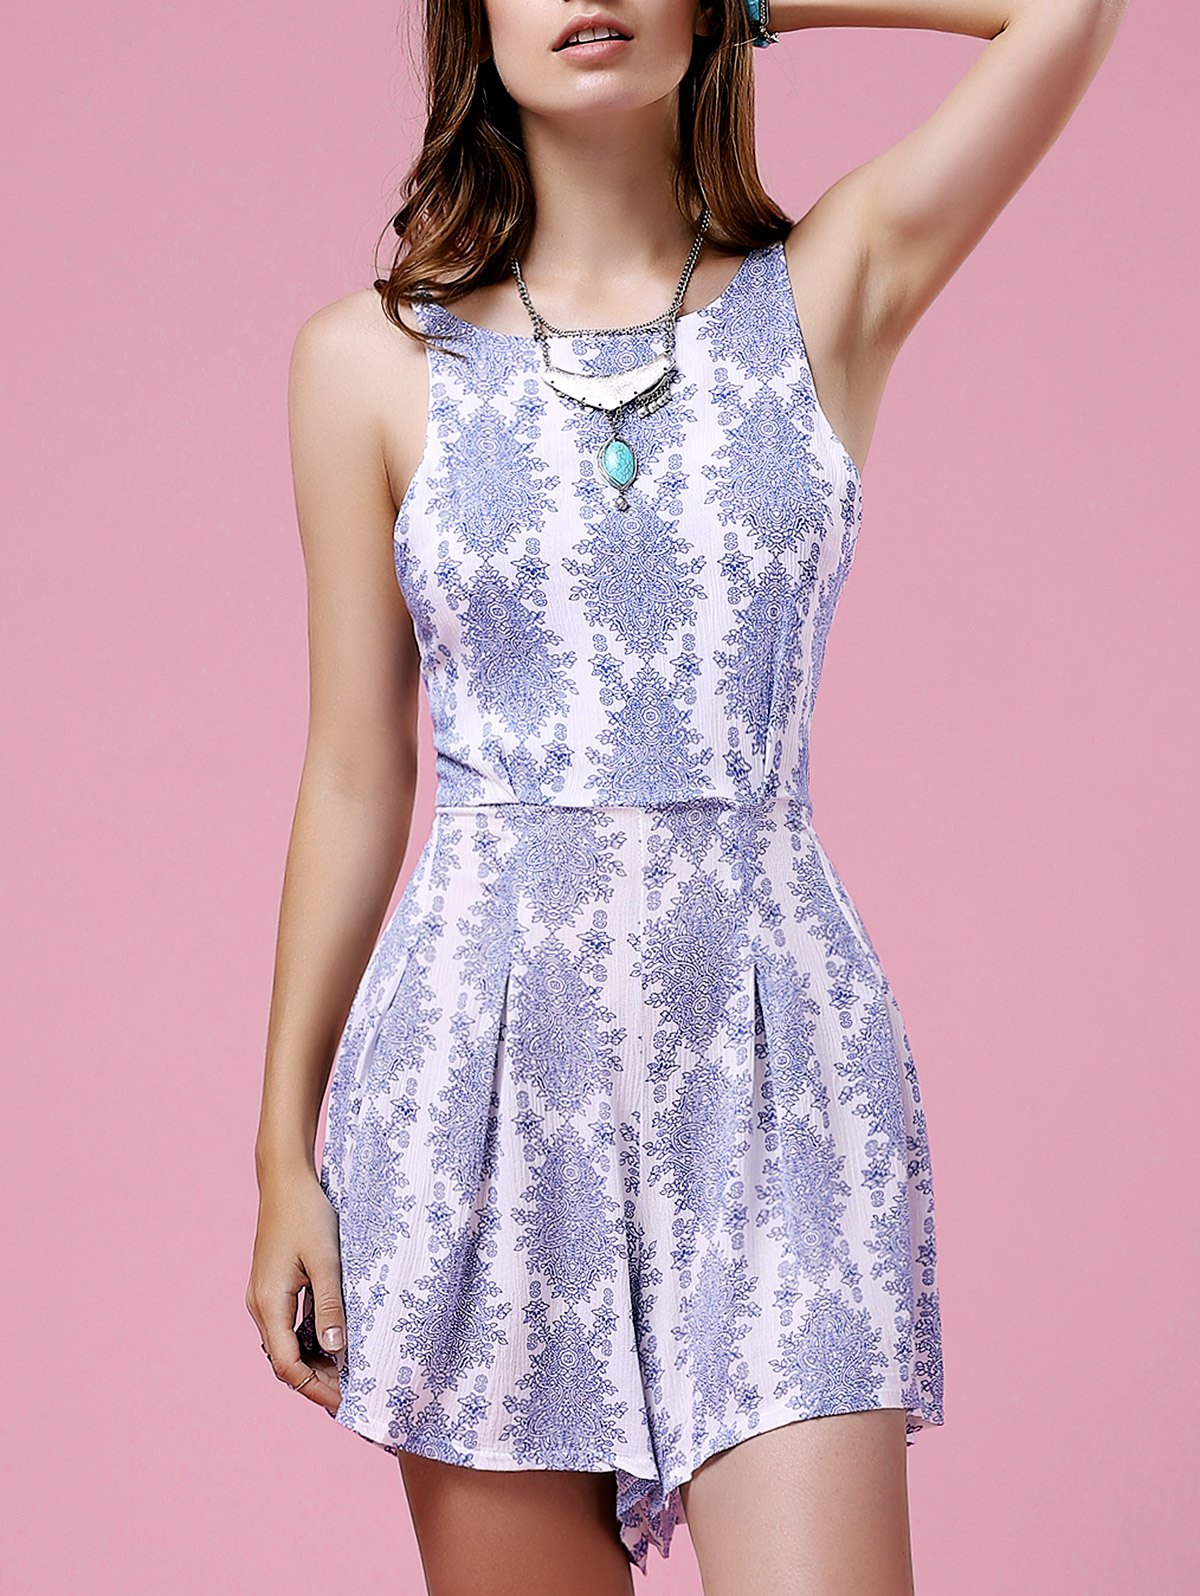 Retro Printed Cut Out Spaghetti Straps Sleeveless Dress